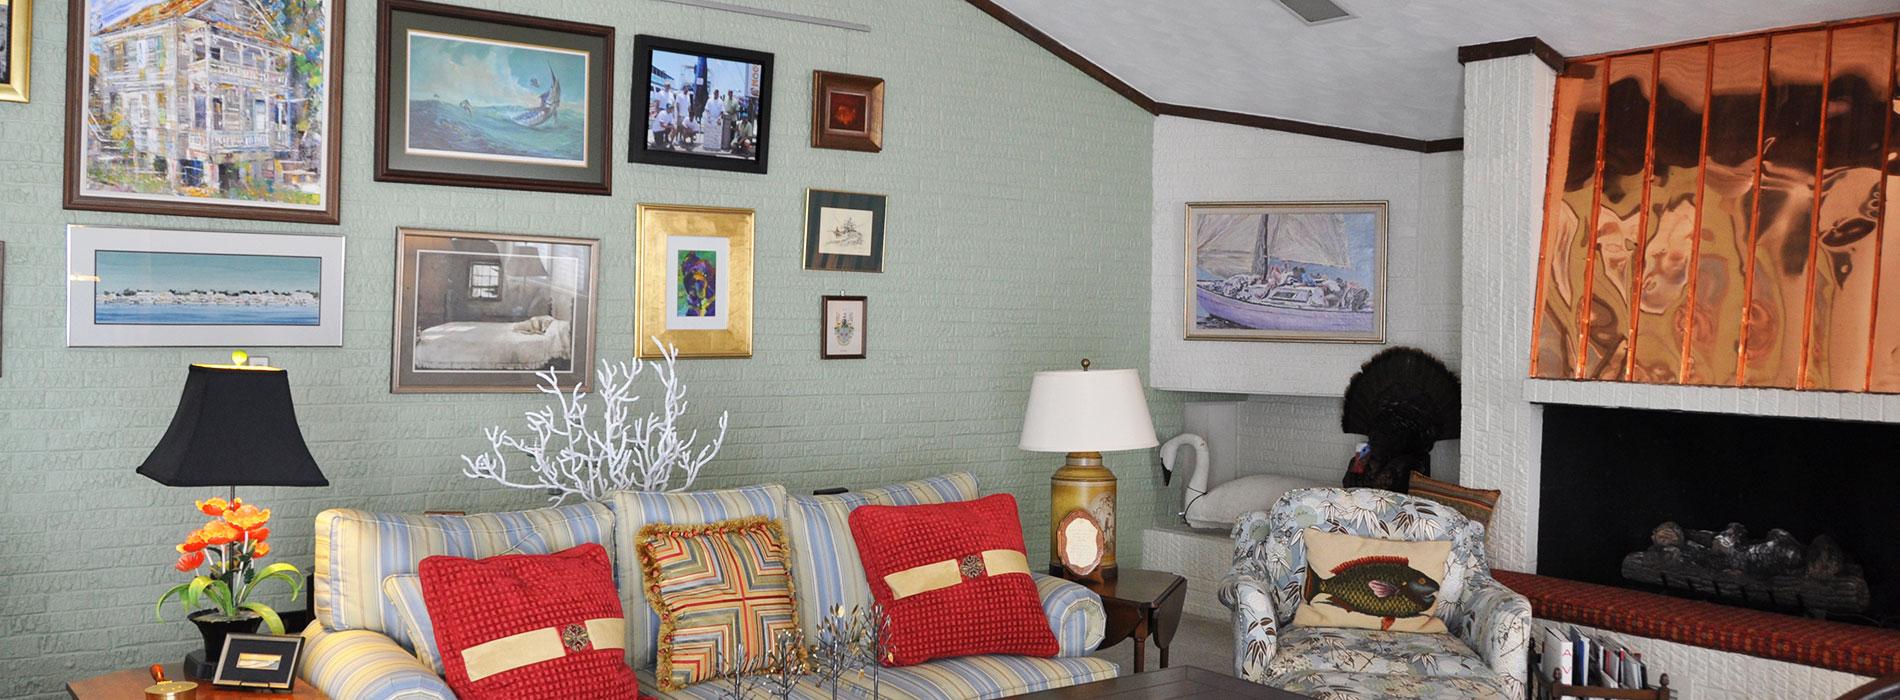 Living Room Design In New Bern Nc